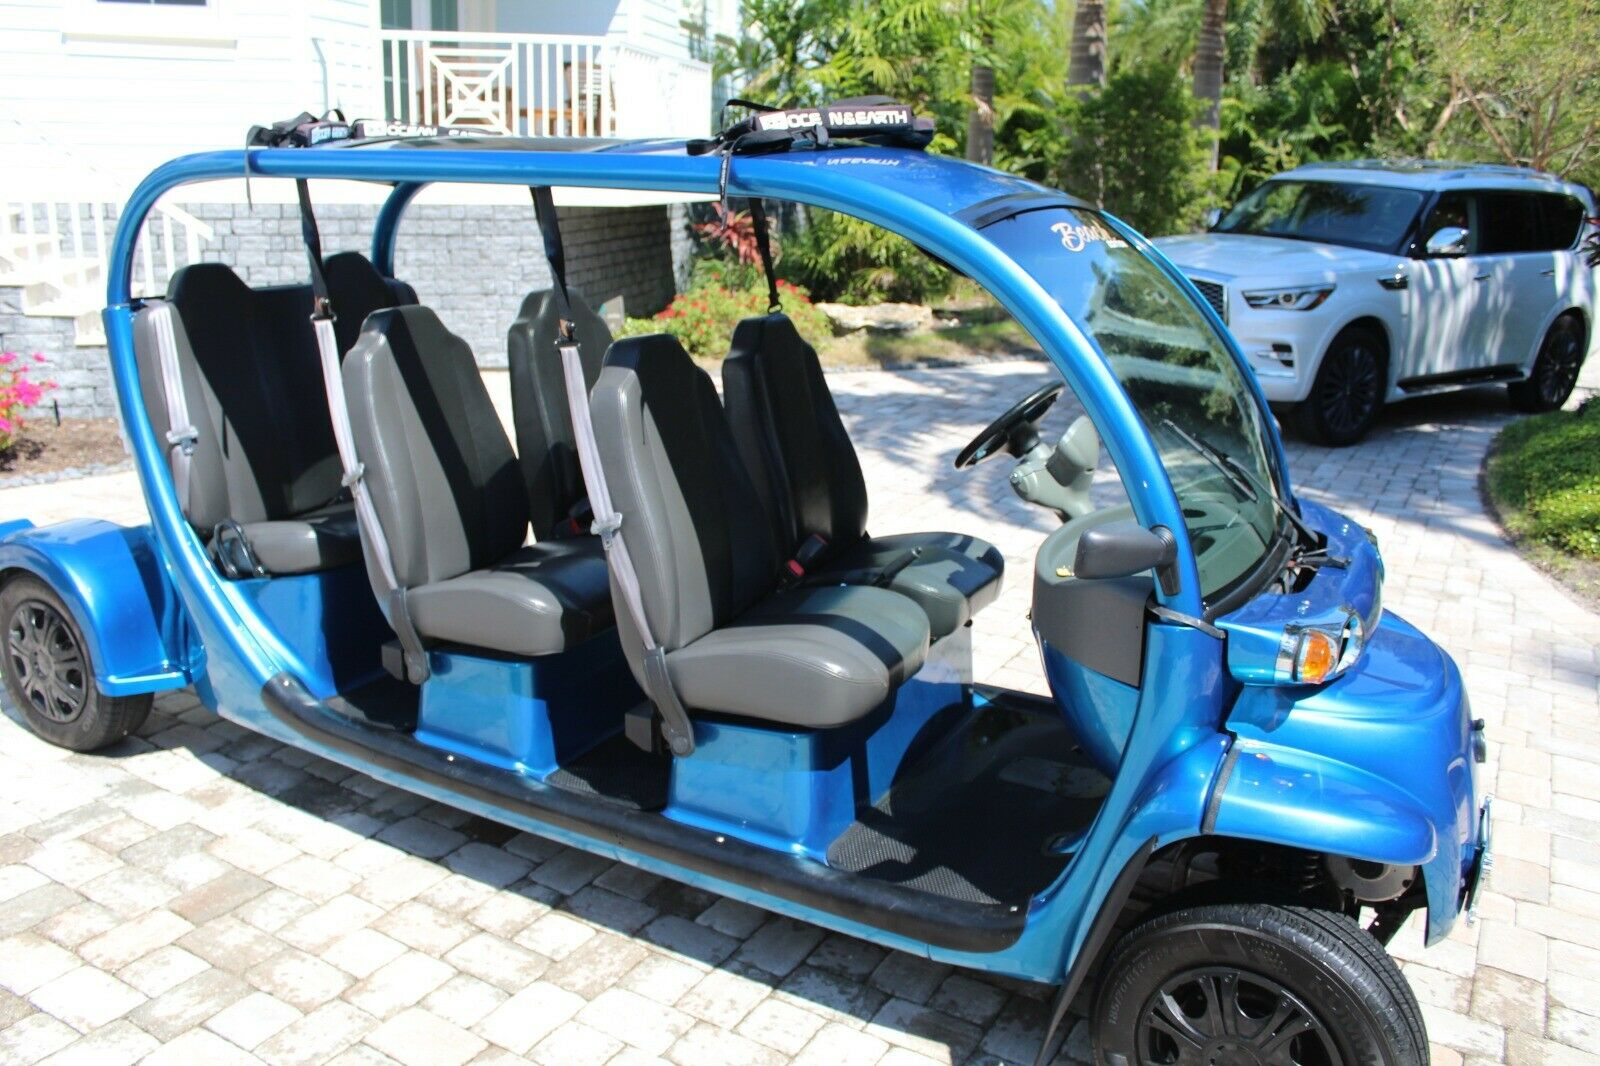 Polaris Gem For Sale >> Unique and Totally Custom 2011 GEM golf cart for sale